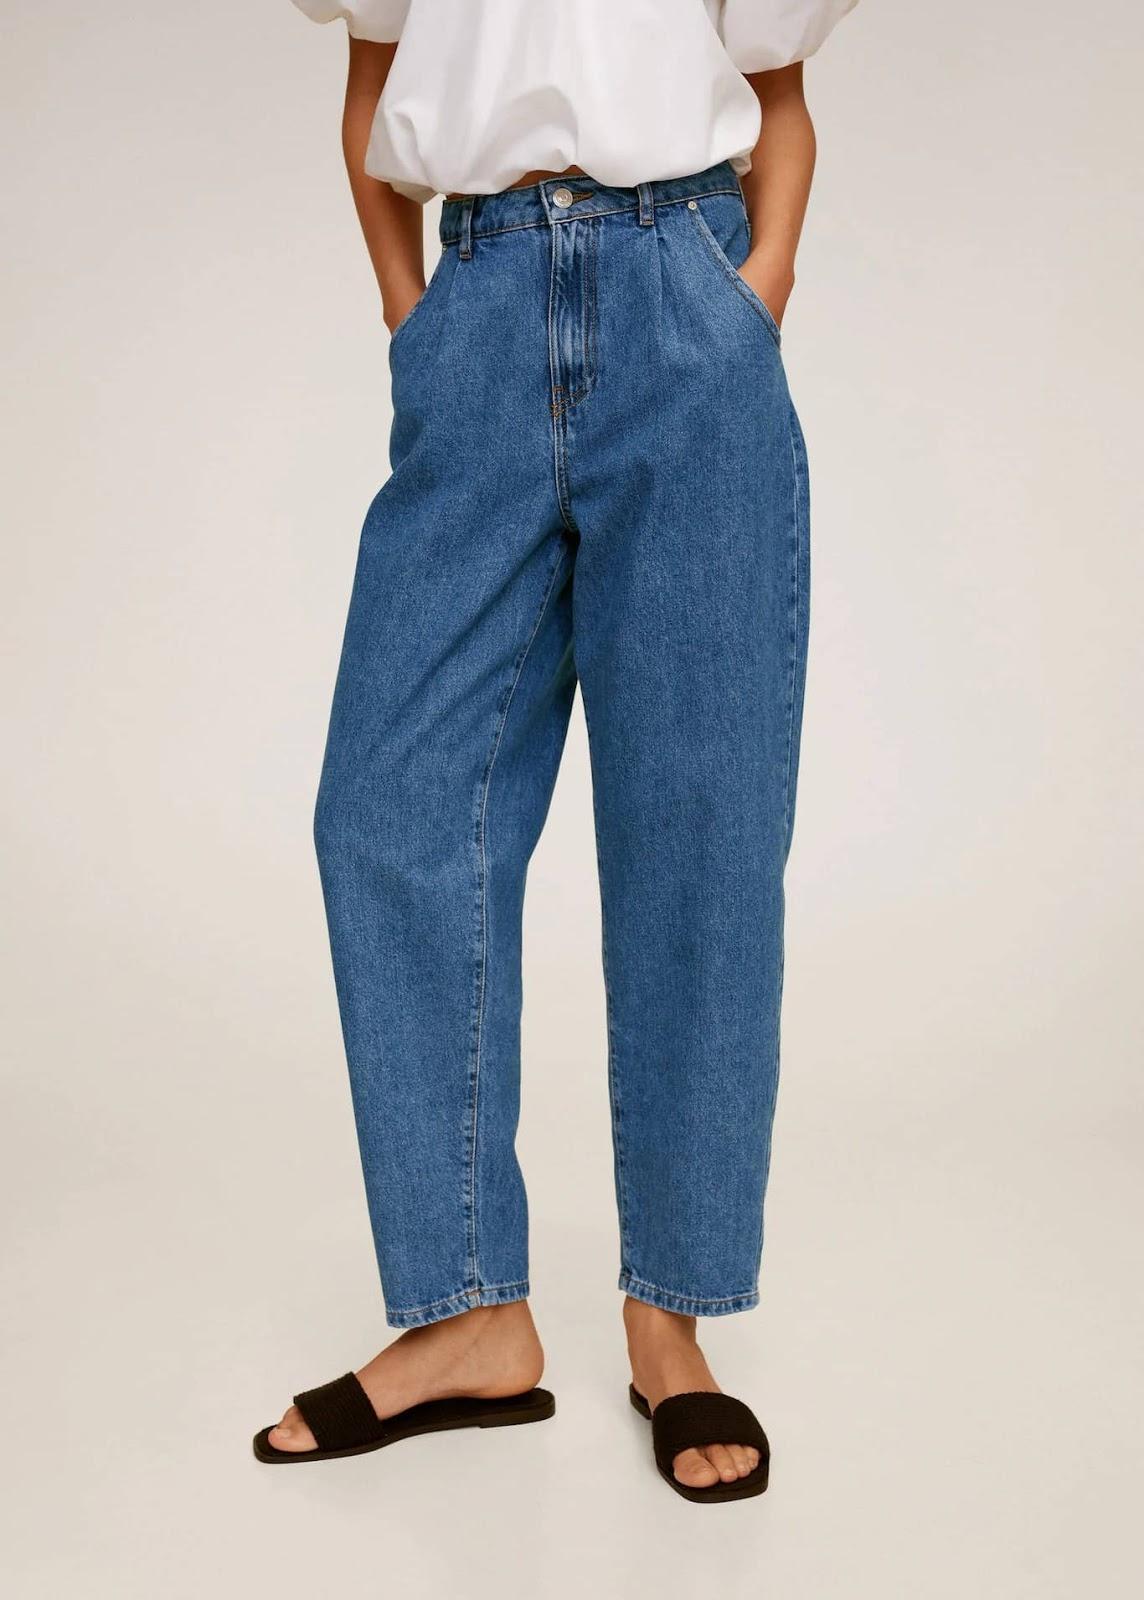 regina slouchy jeans